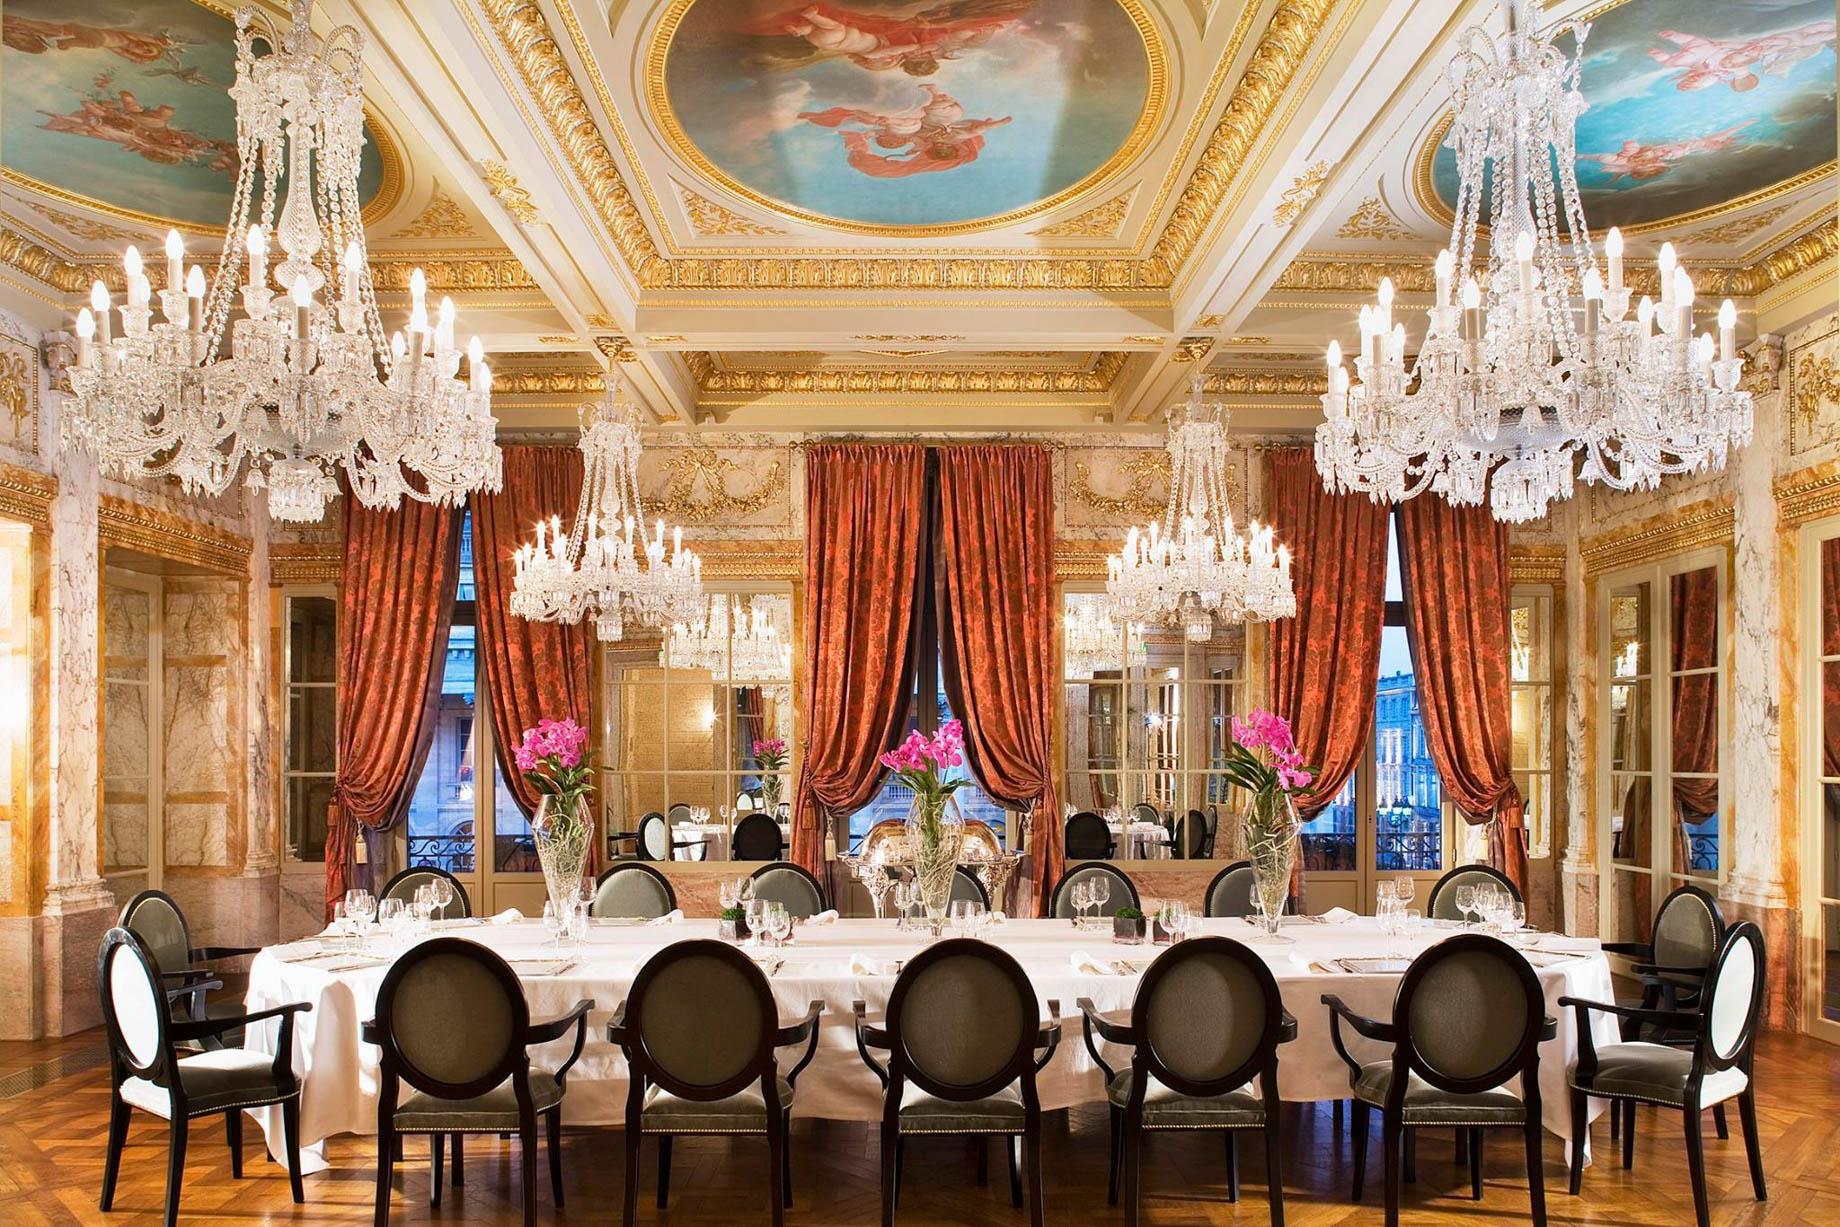 InterContinental Bordeaux Le Grand Hotel - Bordeaux, France - Elegant Refined Dining